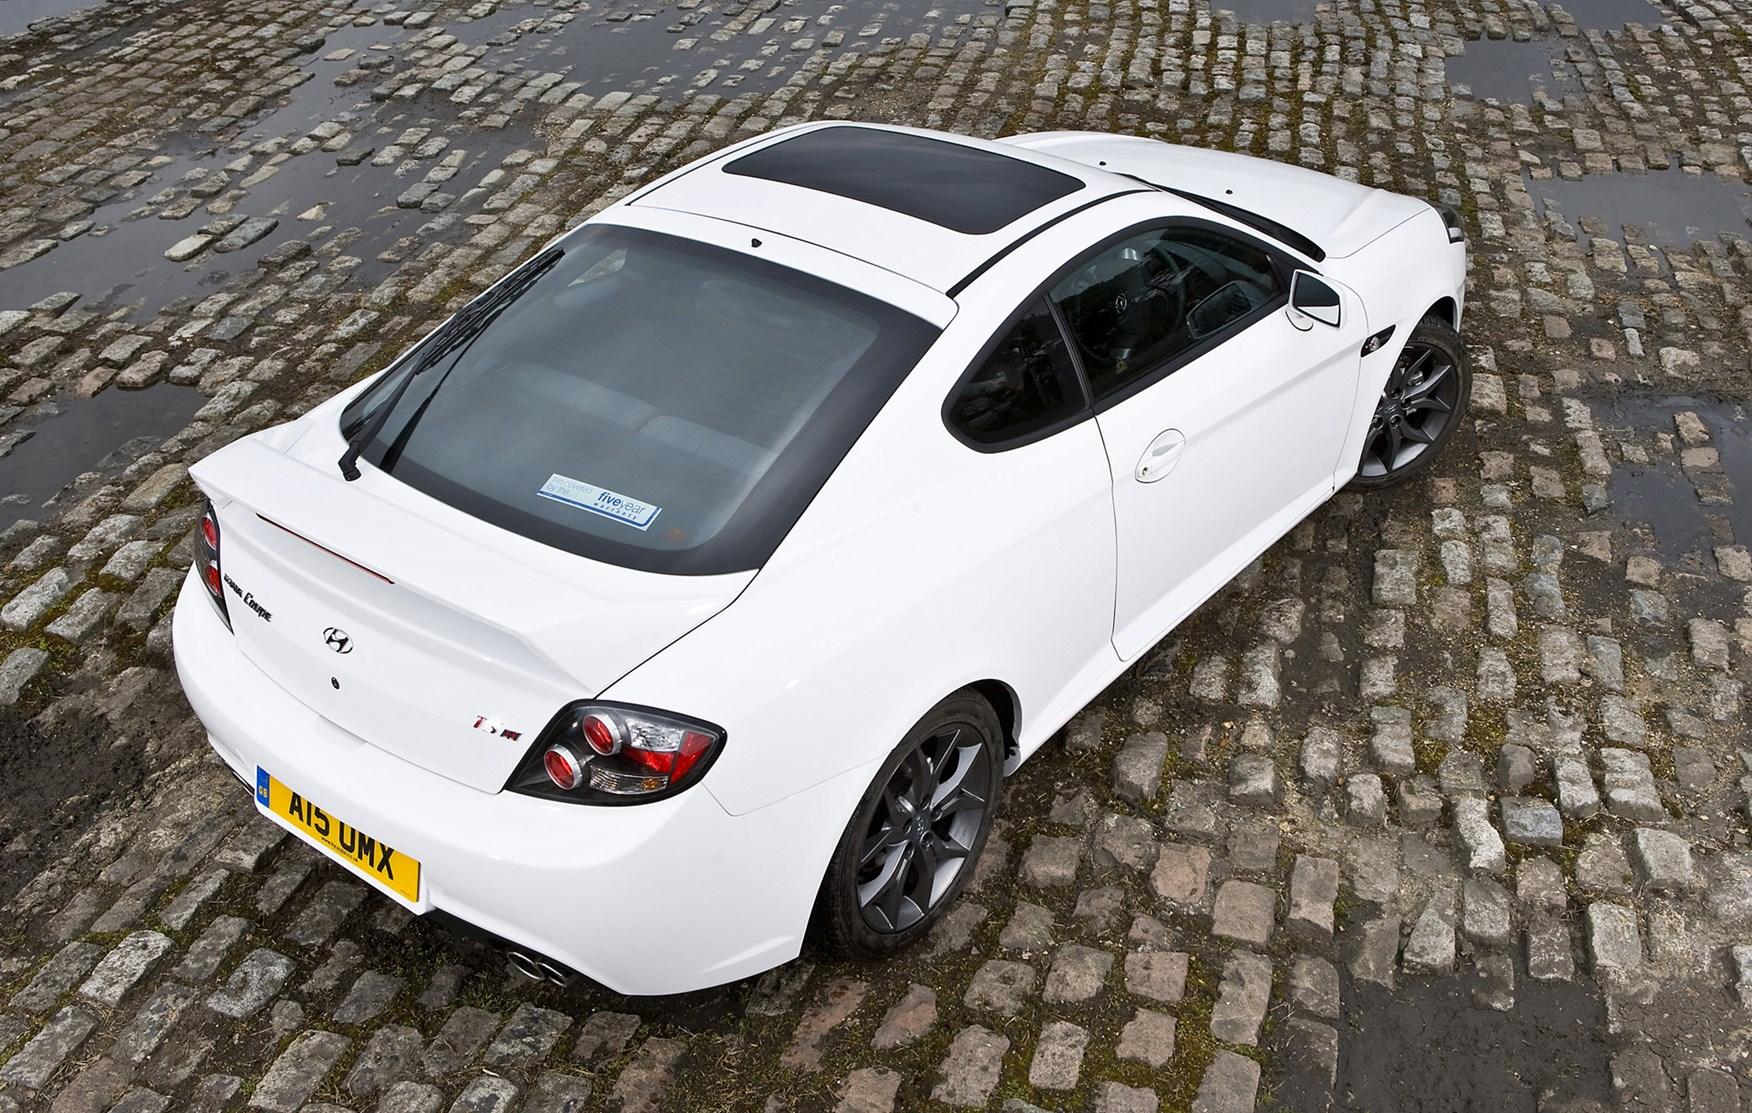 hyundai coupe 1.6 2009 review